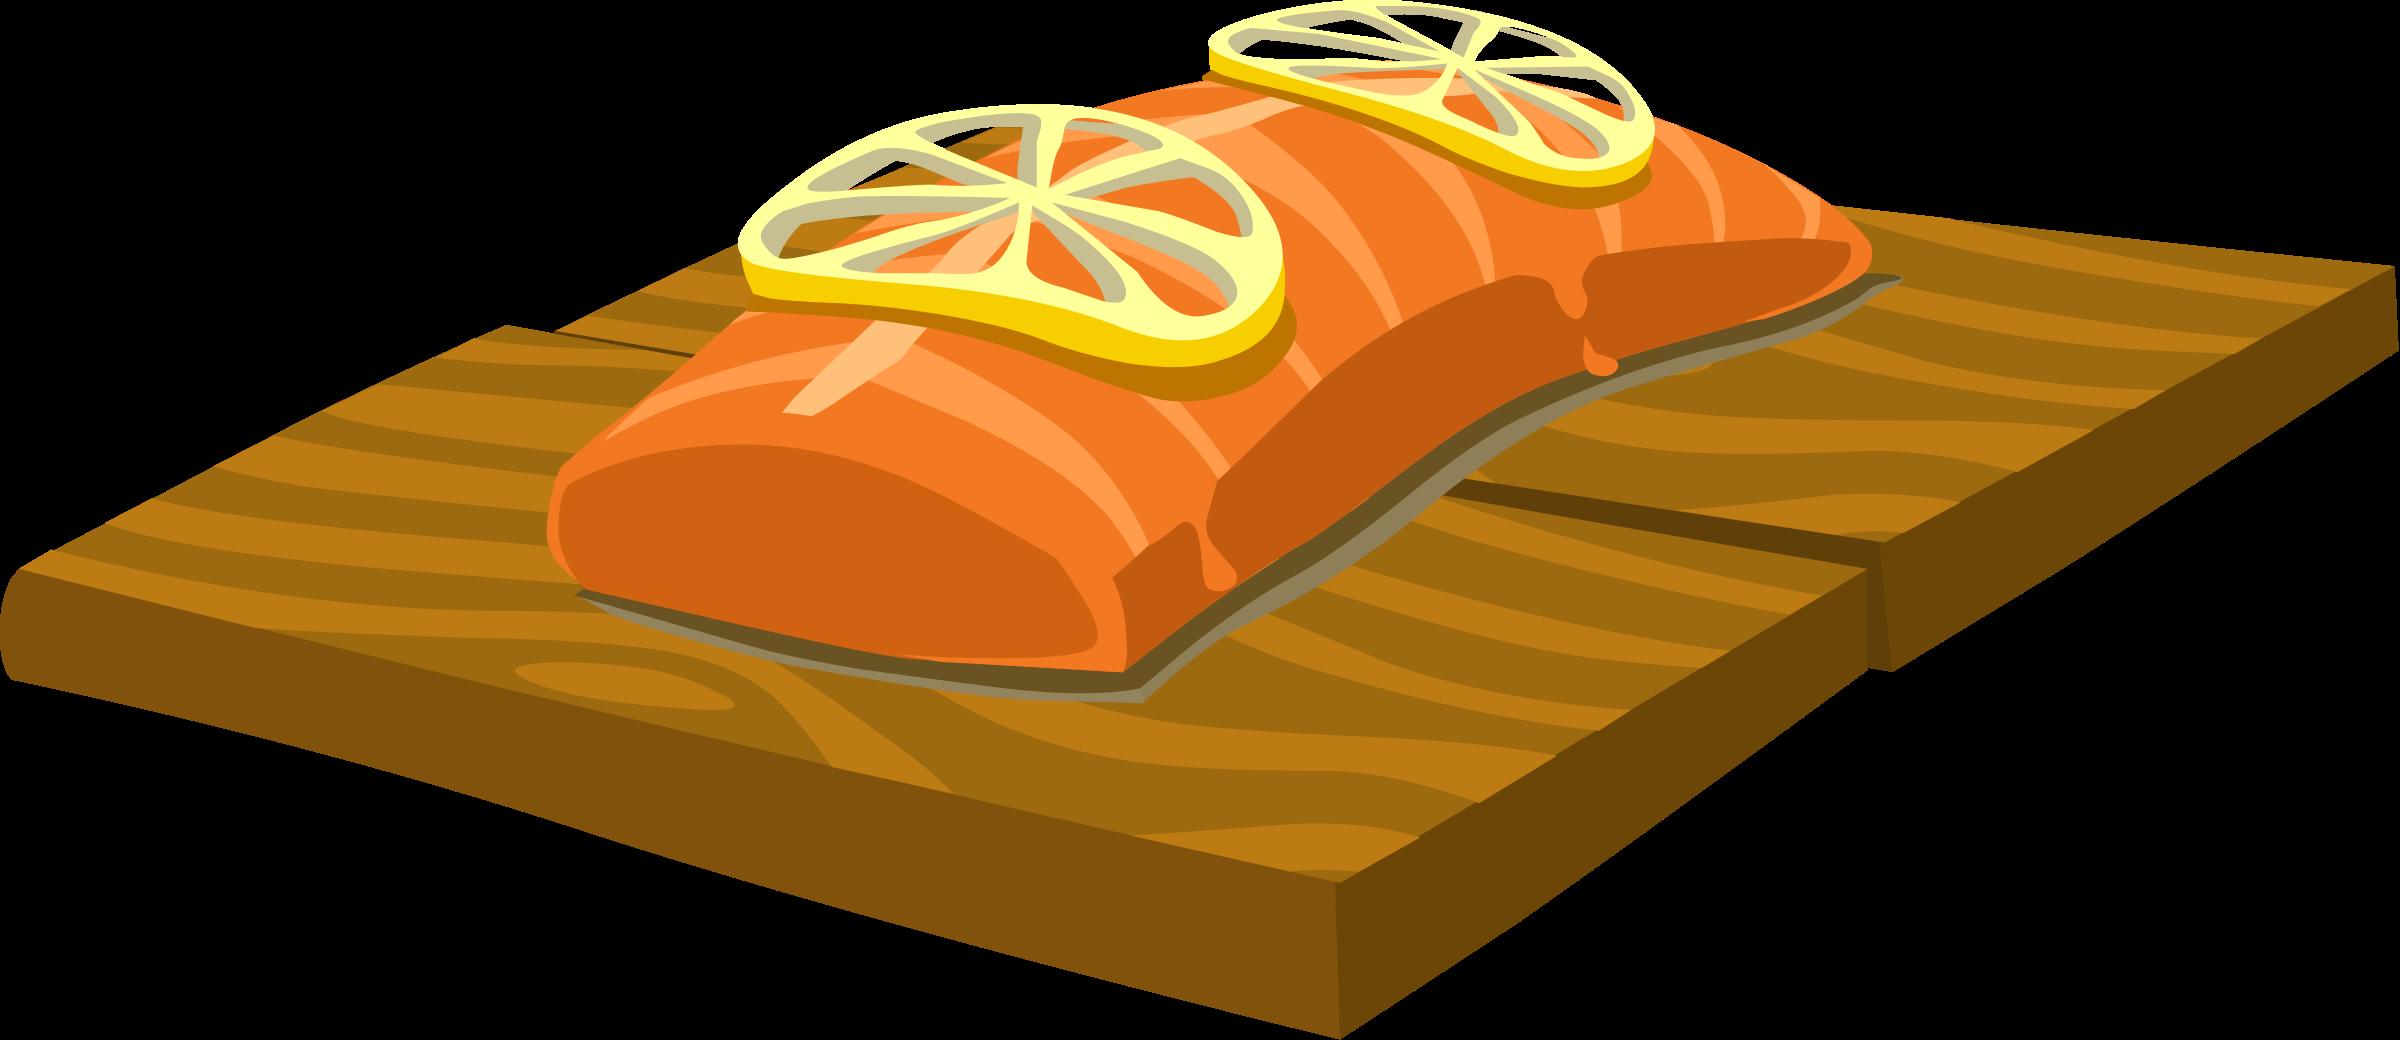 Salmon Clipart.